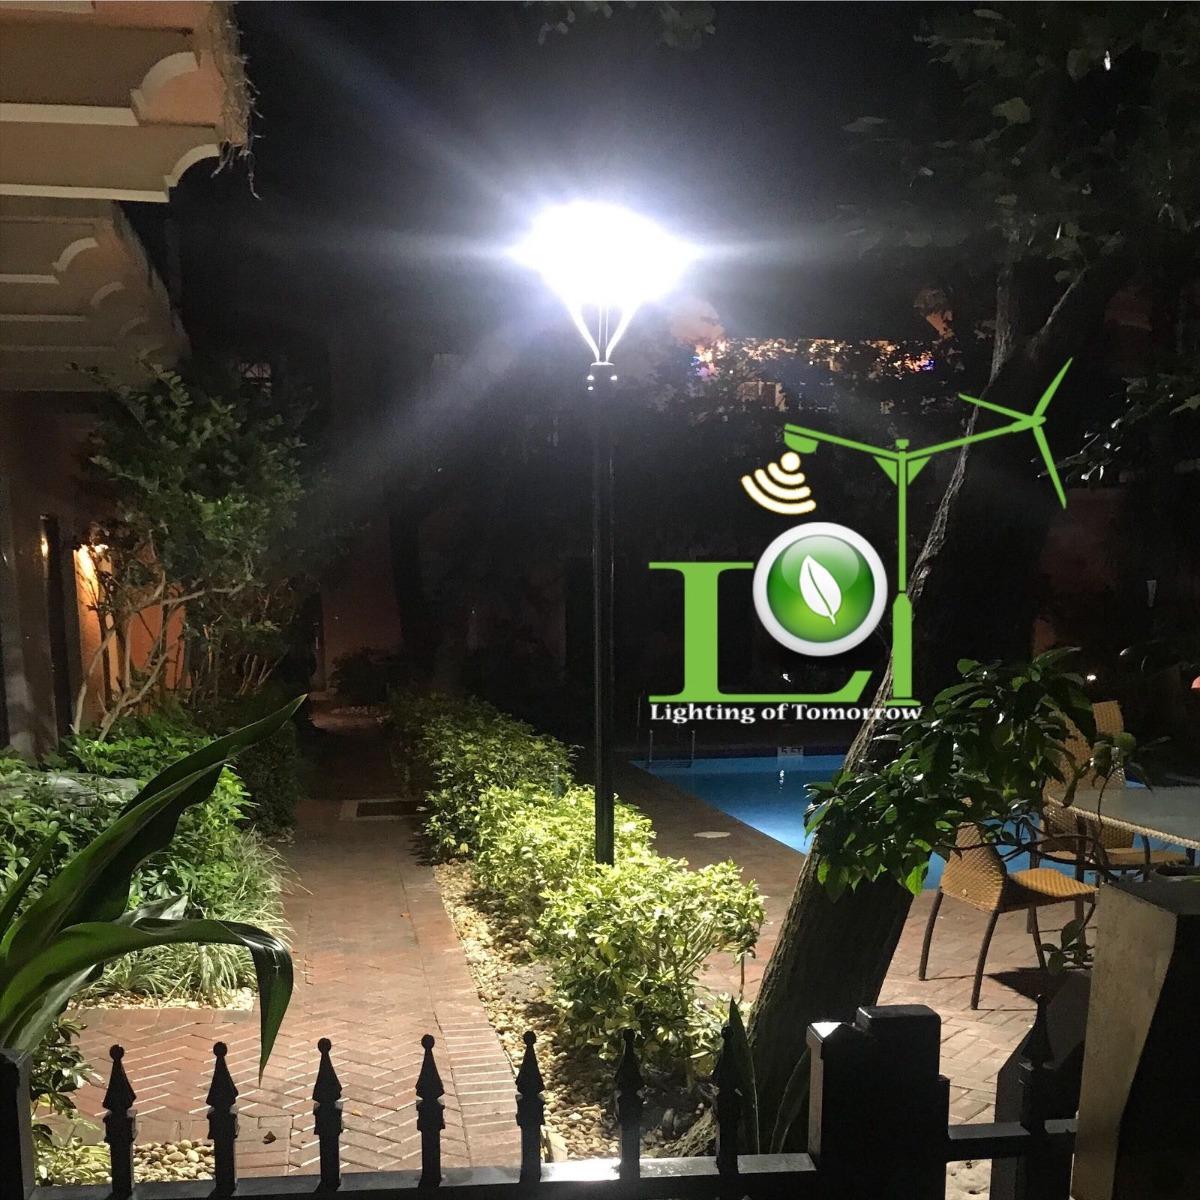 led-pool-area-lighting-of-tomorrow-4